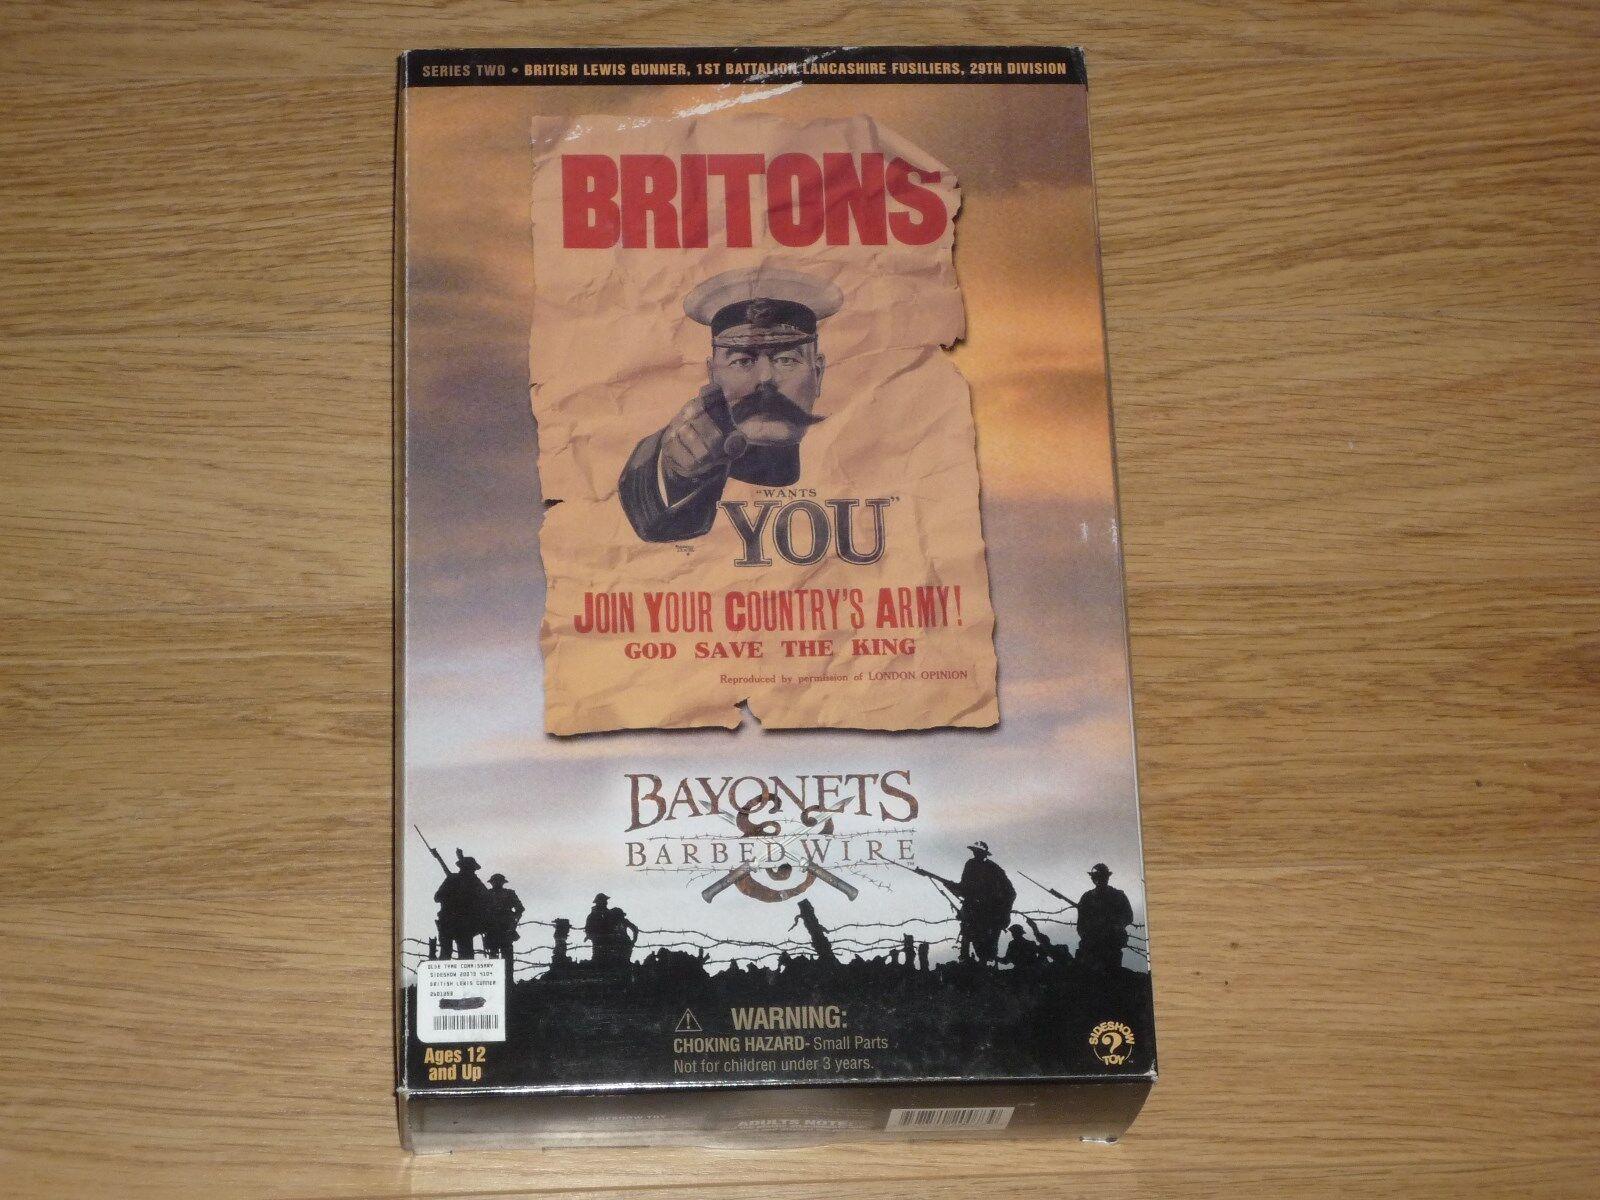 DID BBI DRAGON SIDESHOW BAYONETS BARBED WIRE BRITISH LEWIS GUNNER WW1 1914